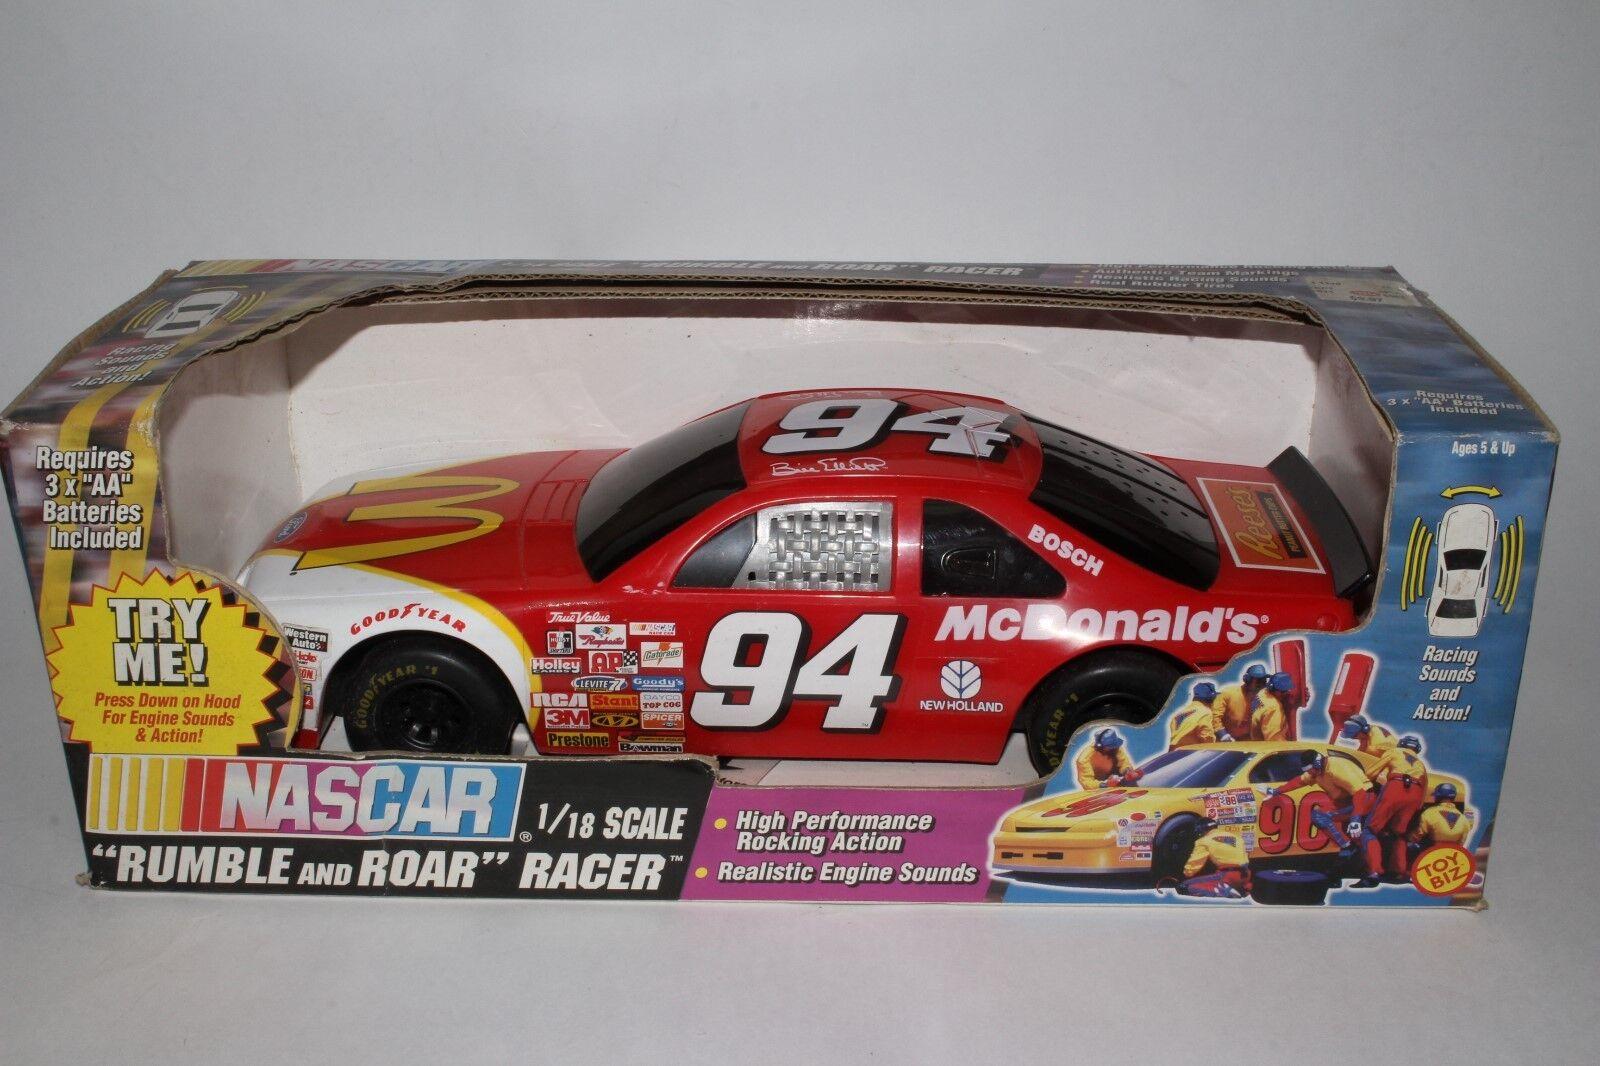 TOY BIZ 1997 NASCAR McDONALDS BILL ELLIOTT 1 18 SCALE RUMBLE AND ROAR